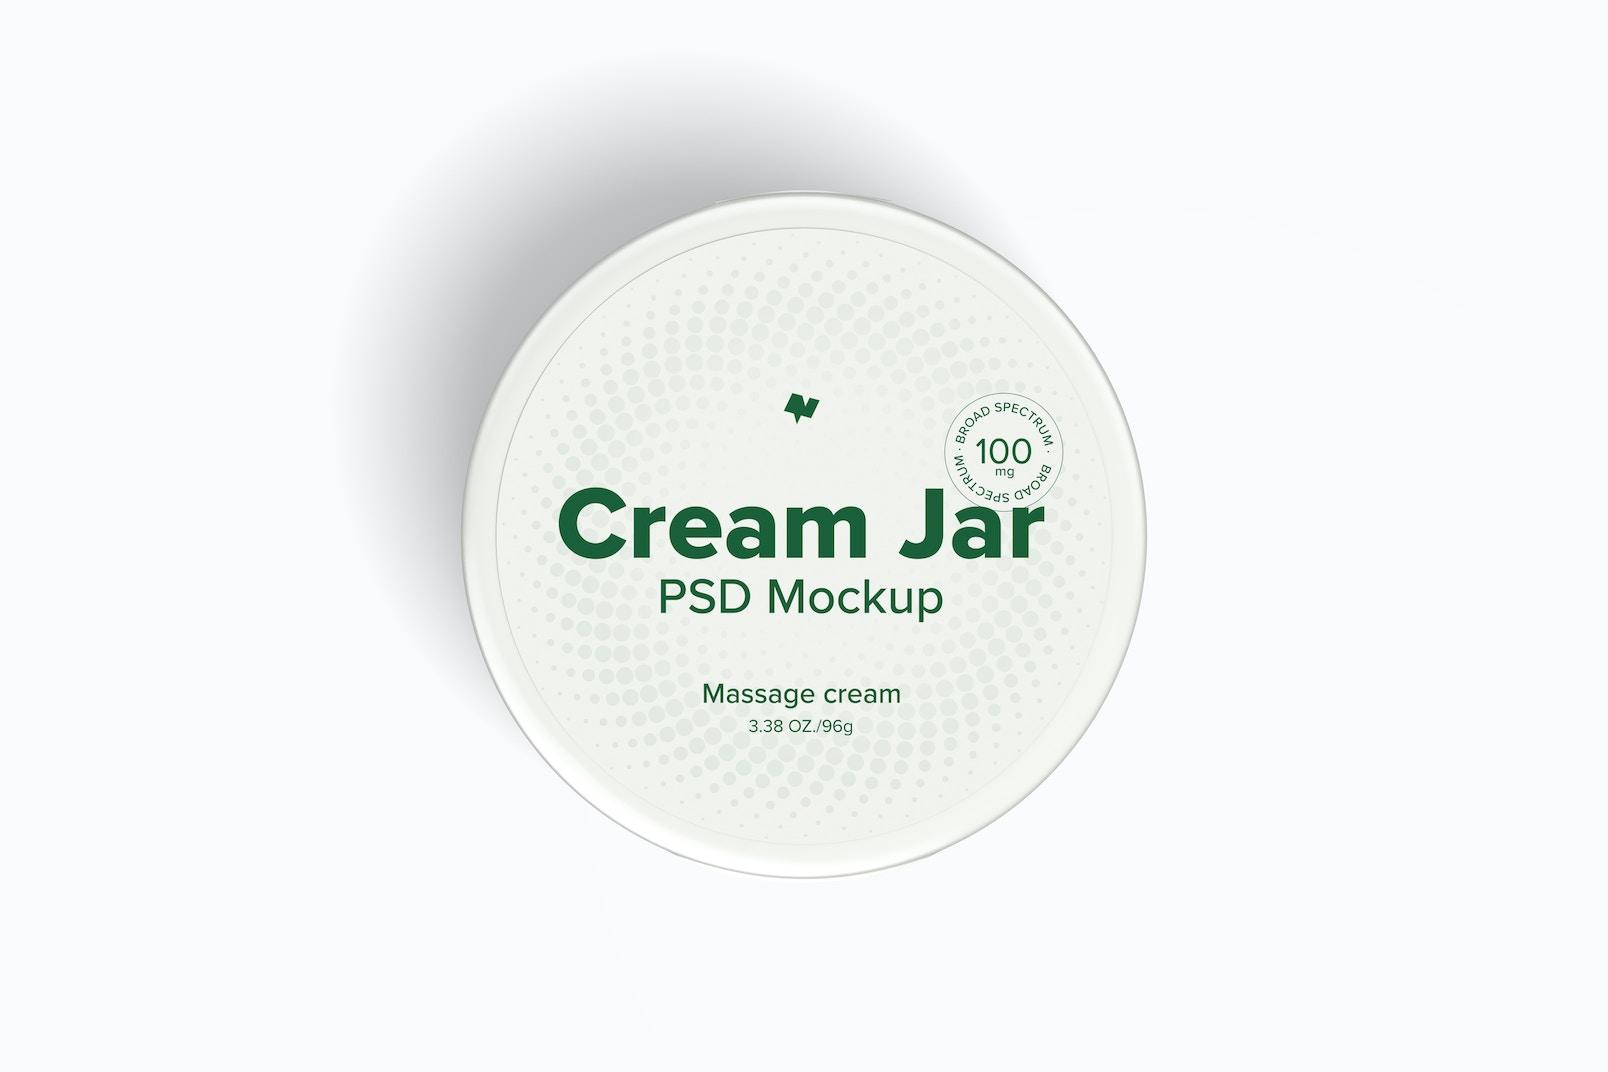 3.38 oz Cream Jar Mockup, Top View